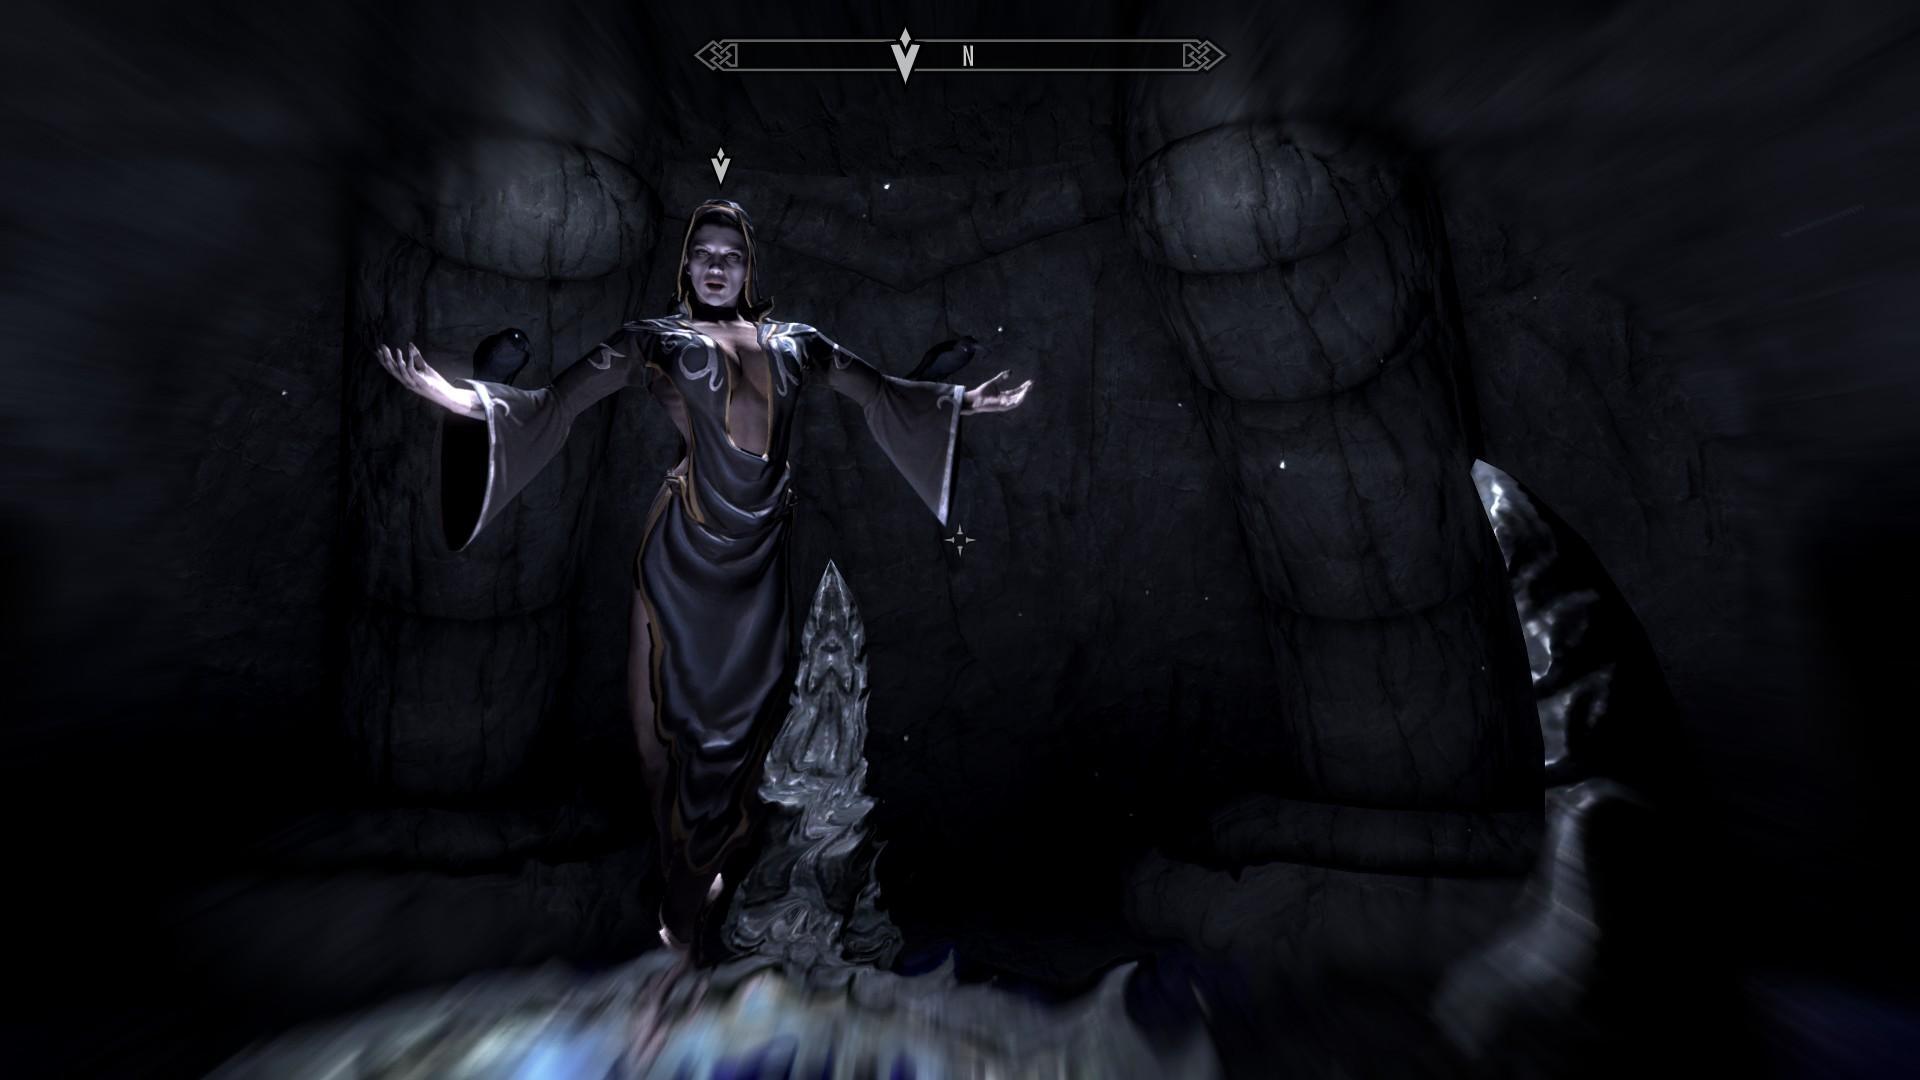 20180616152842_1.jpg - Elder Scrolls 5: Skyrim, the